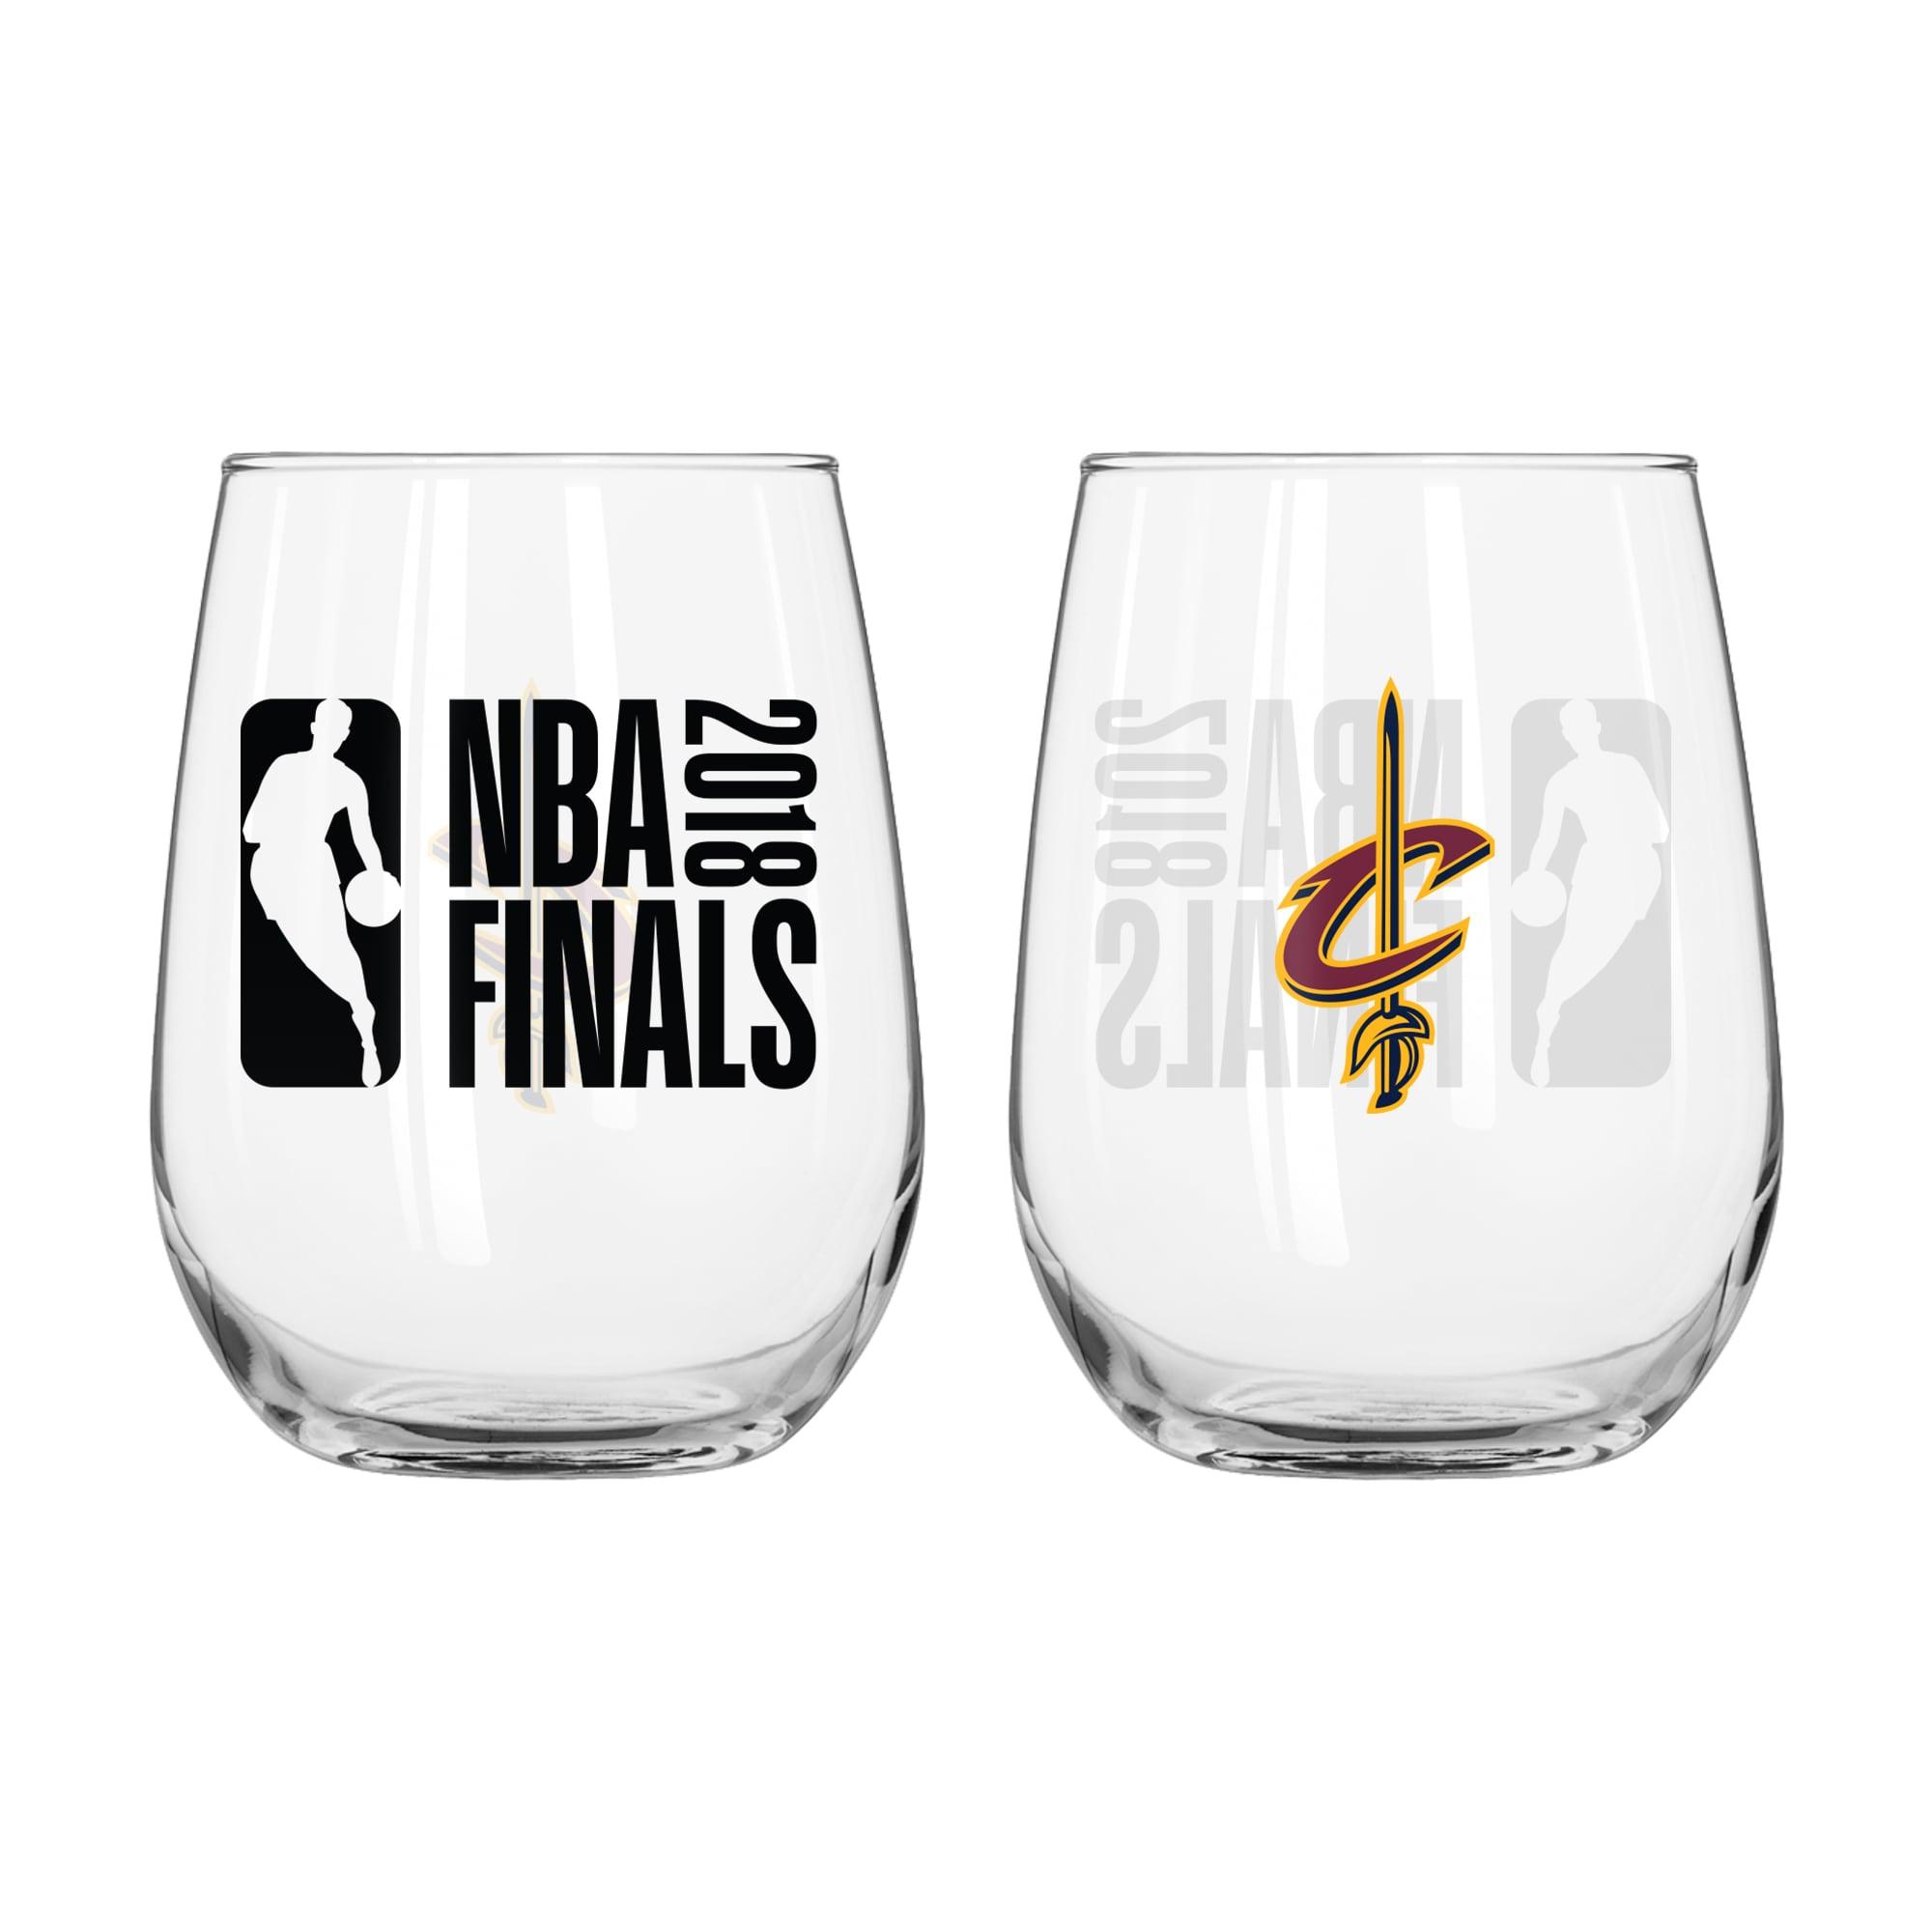 Cleveland Cavaliers 2018 NBA Finals Bound 12oz. Stemless Wine Glass